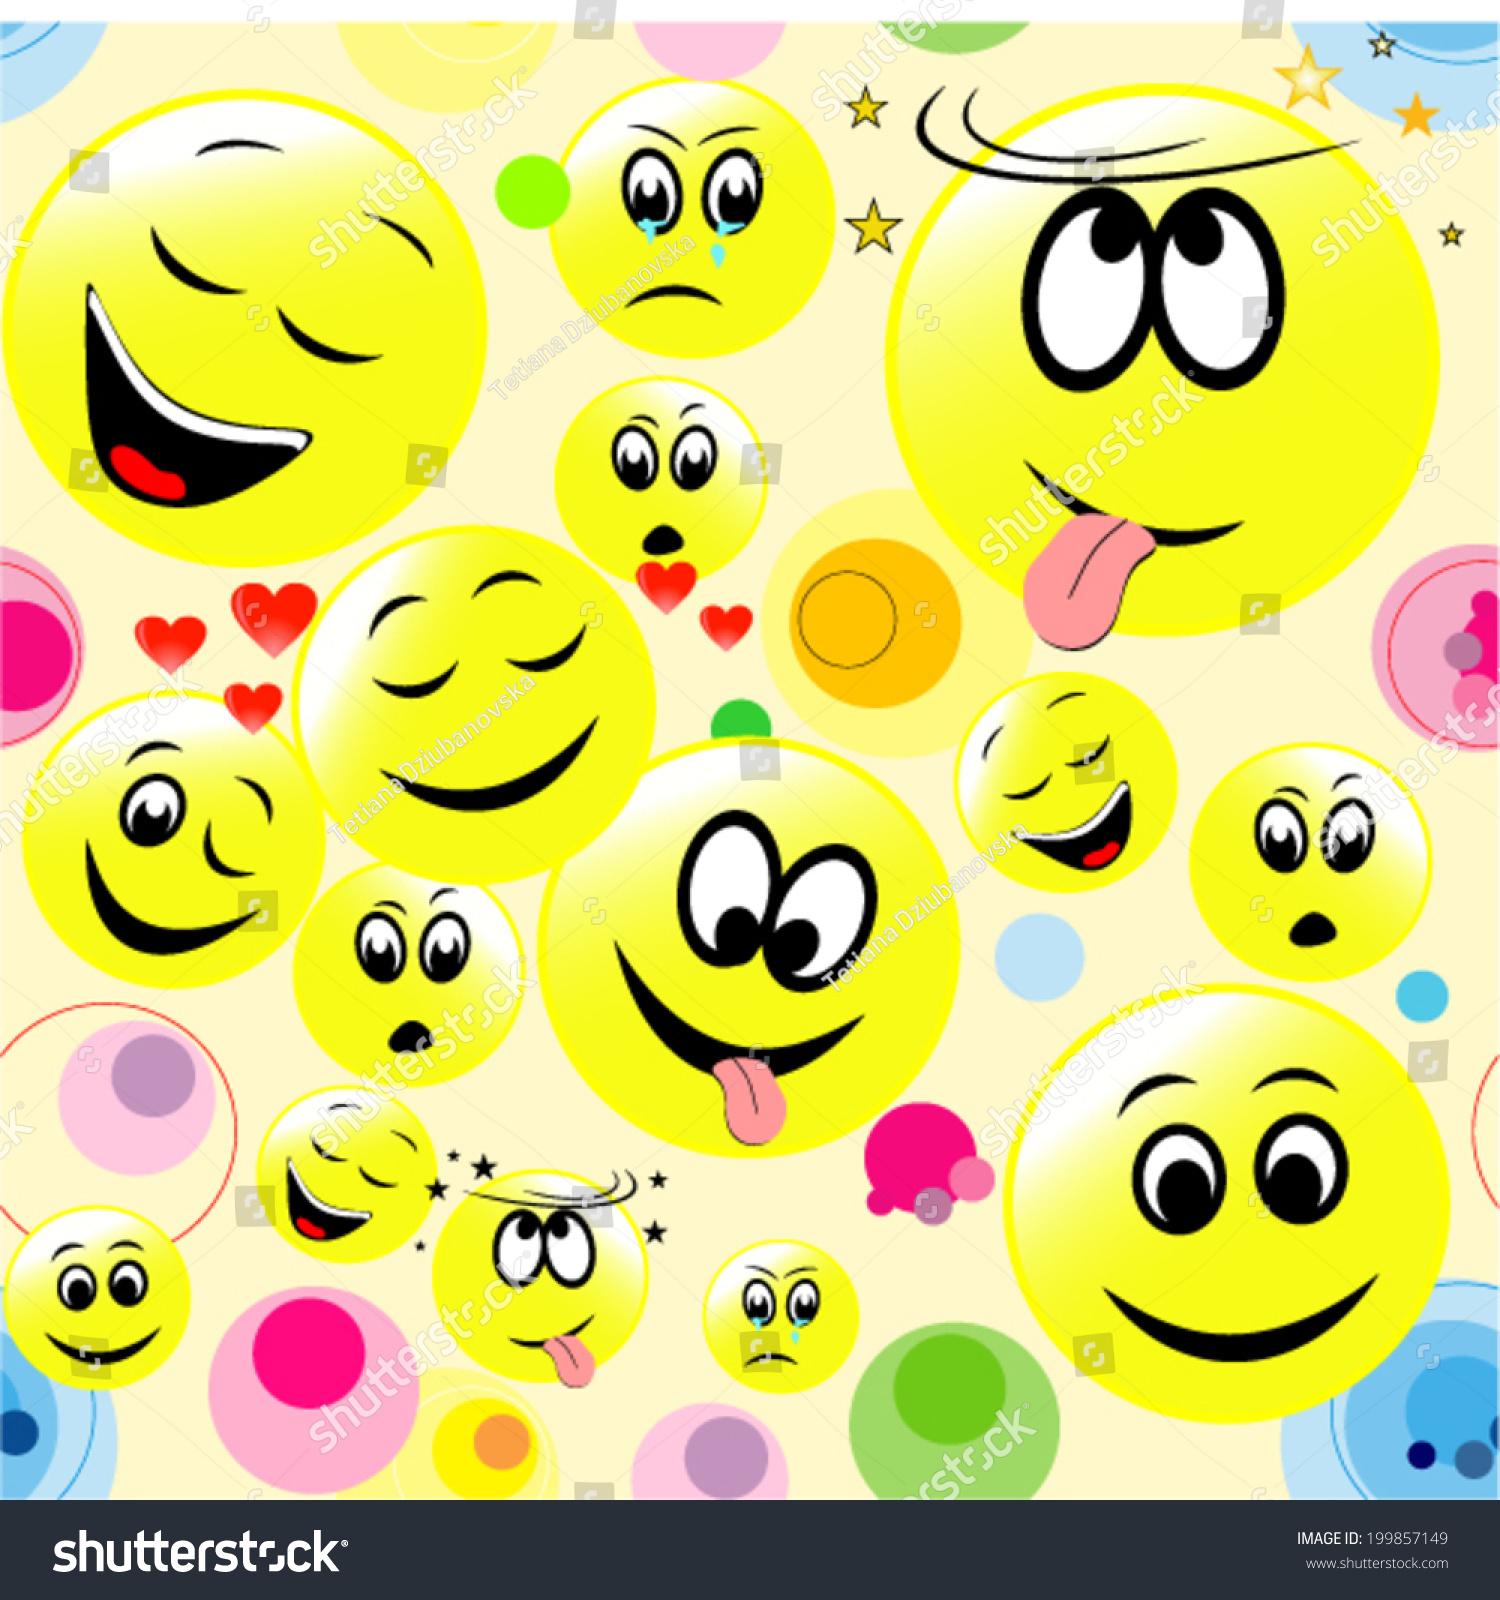 pin colourfulsmileyfacebackgrounds on pinterest